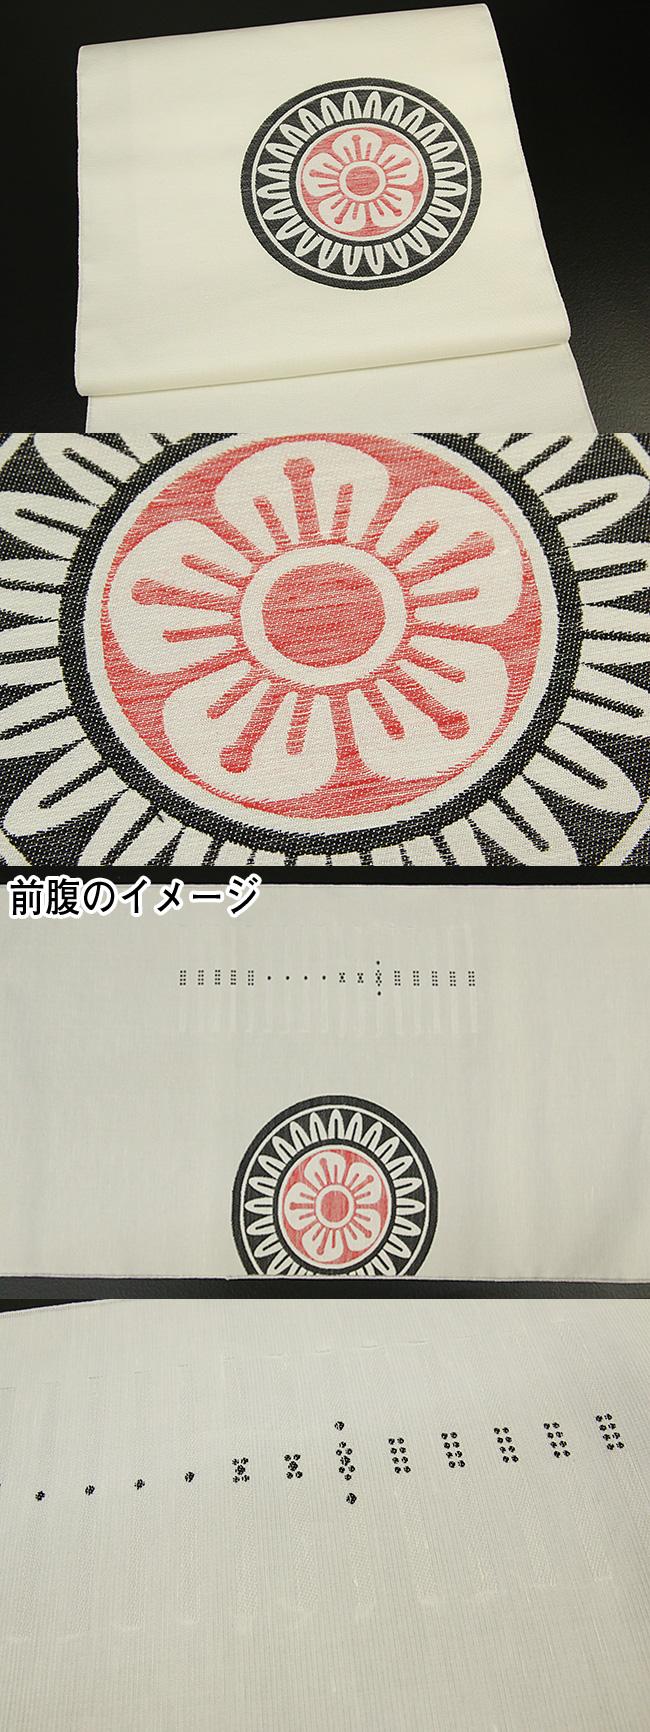 96_tsutaya_obi0102